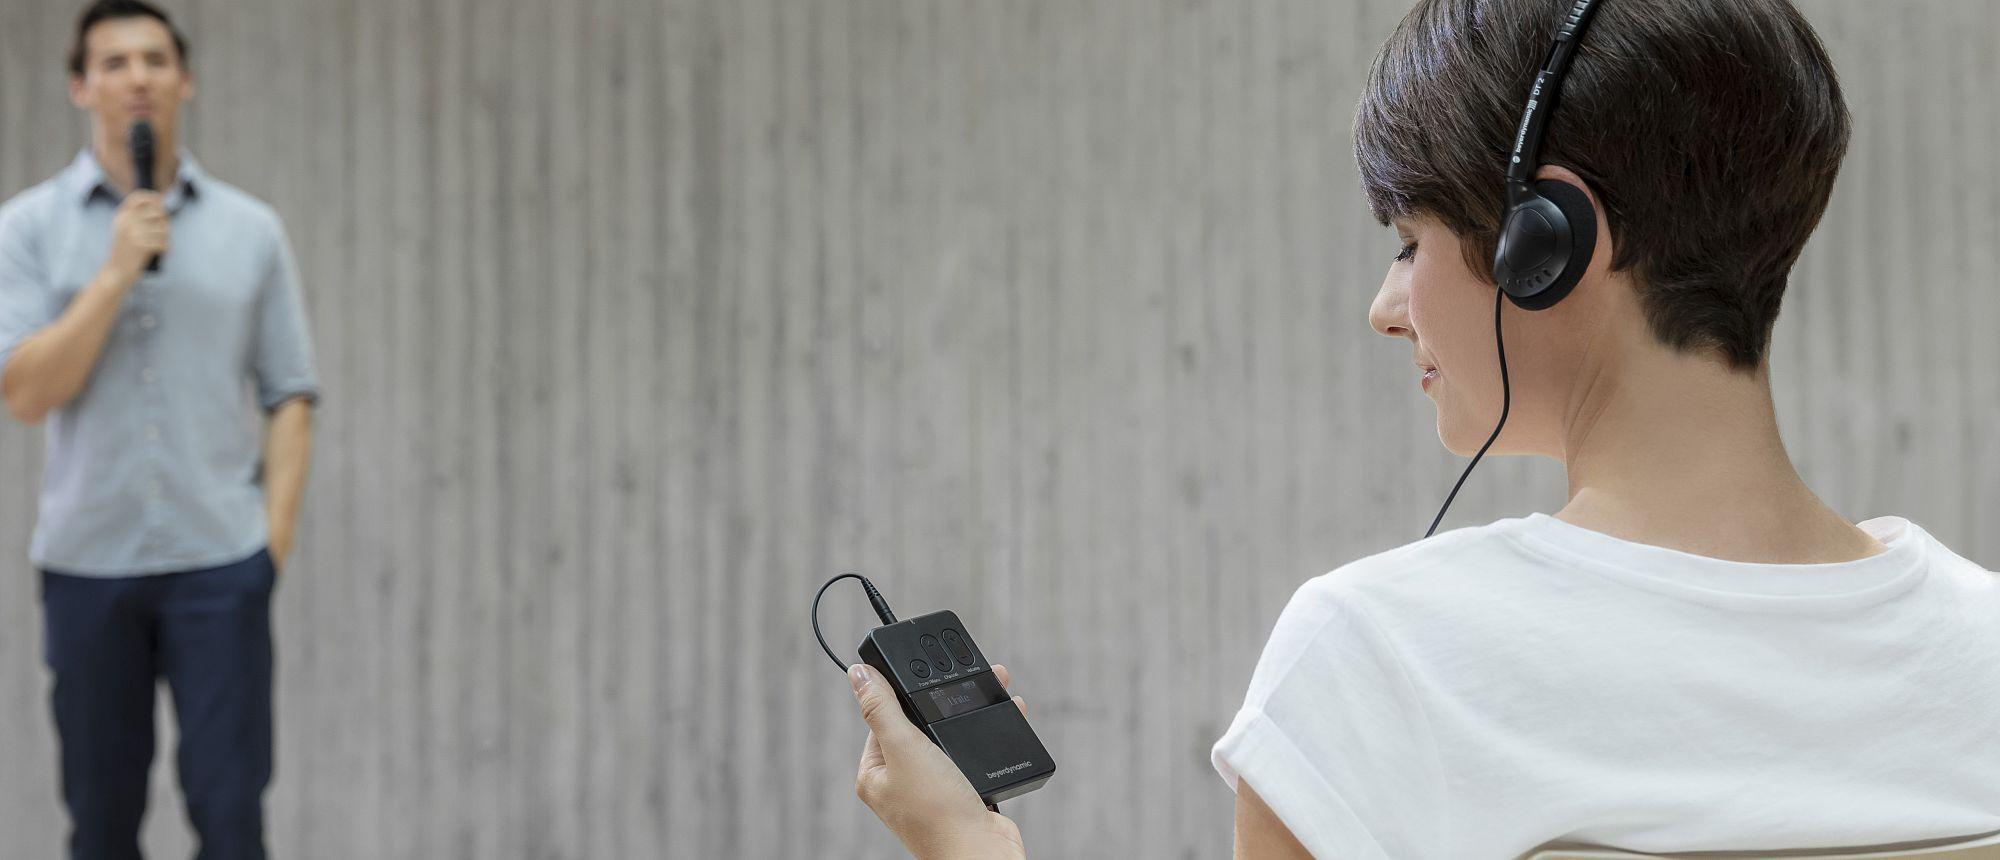 beyerdynamic unite tour guide audio guia interprete ate 32 idiomas